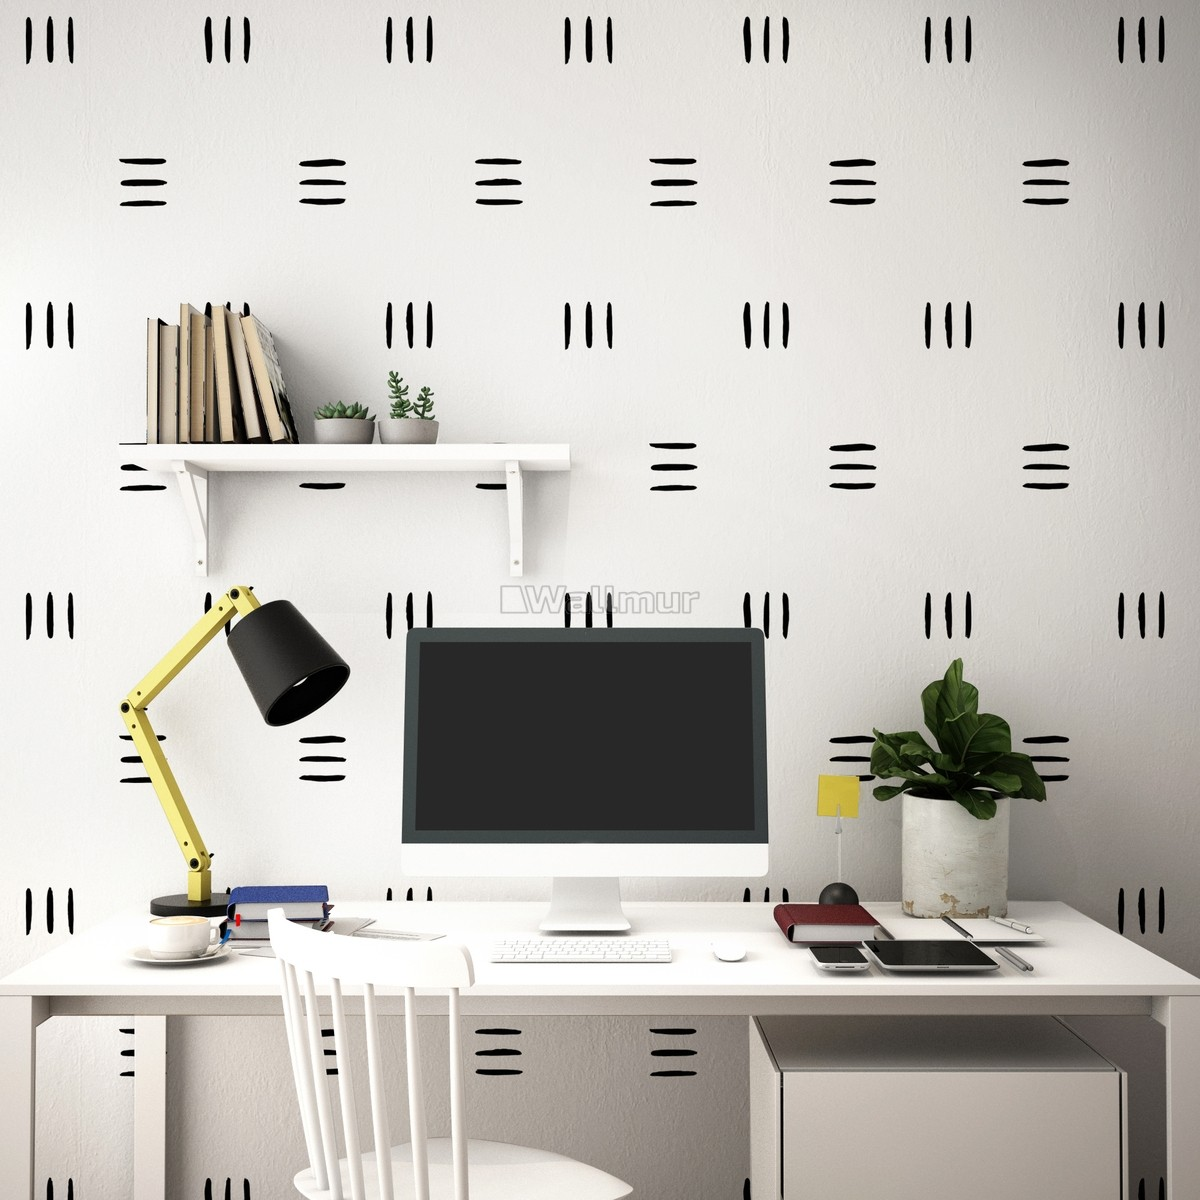 Geometric Black Line Wall Decal Sticker